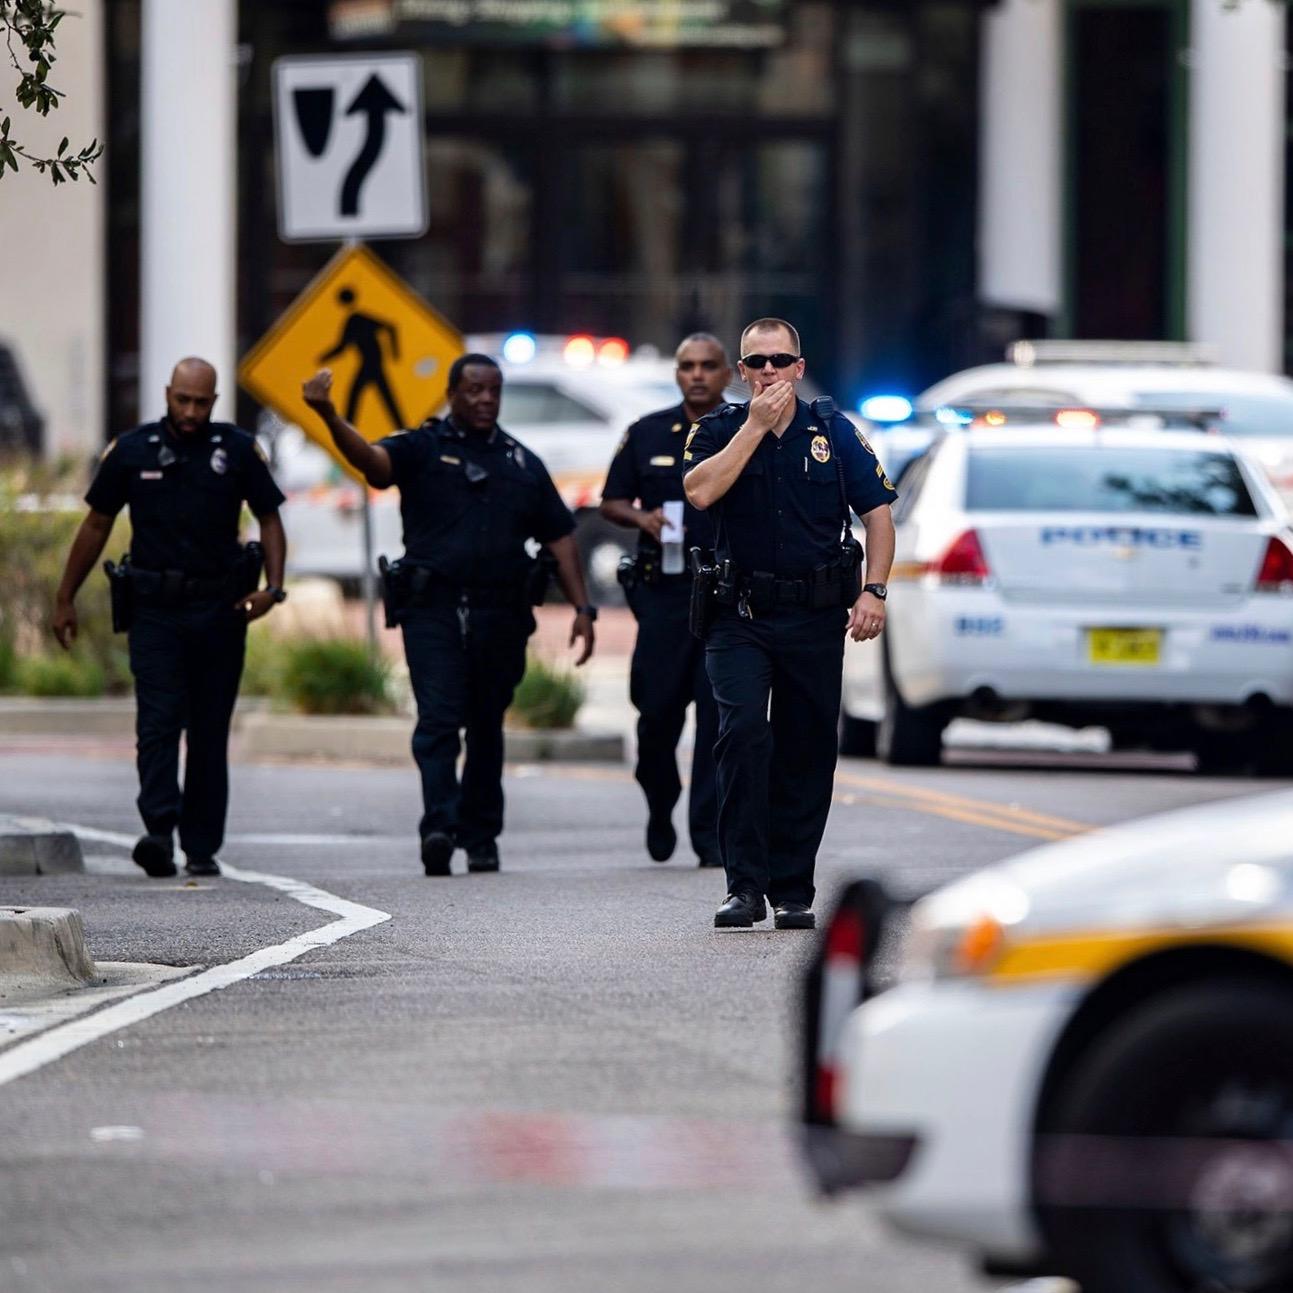 Jacksonville Shooter Bought Guns Legally Despite Mental Health Issues [VIDEO]